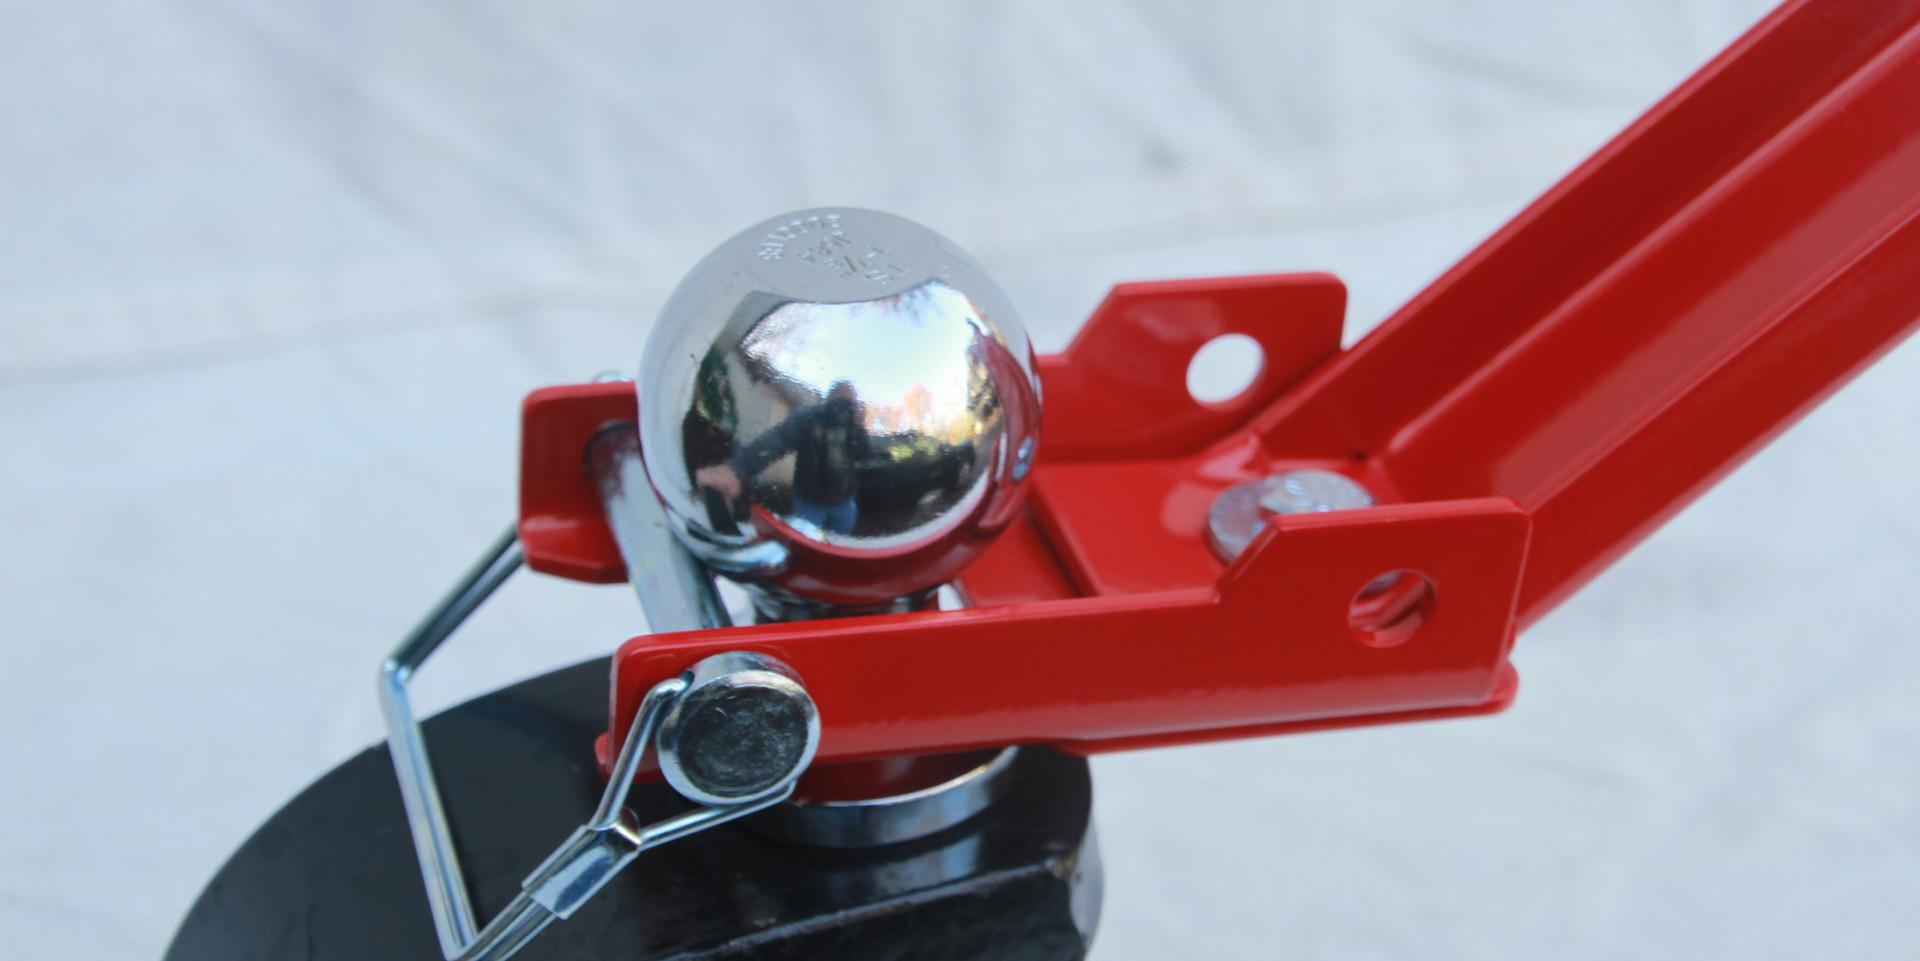 Ball mounting pin to ball.jpg